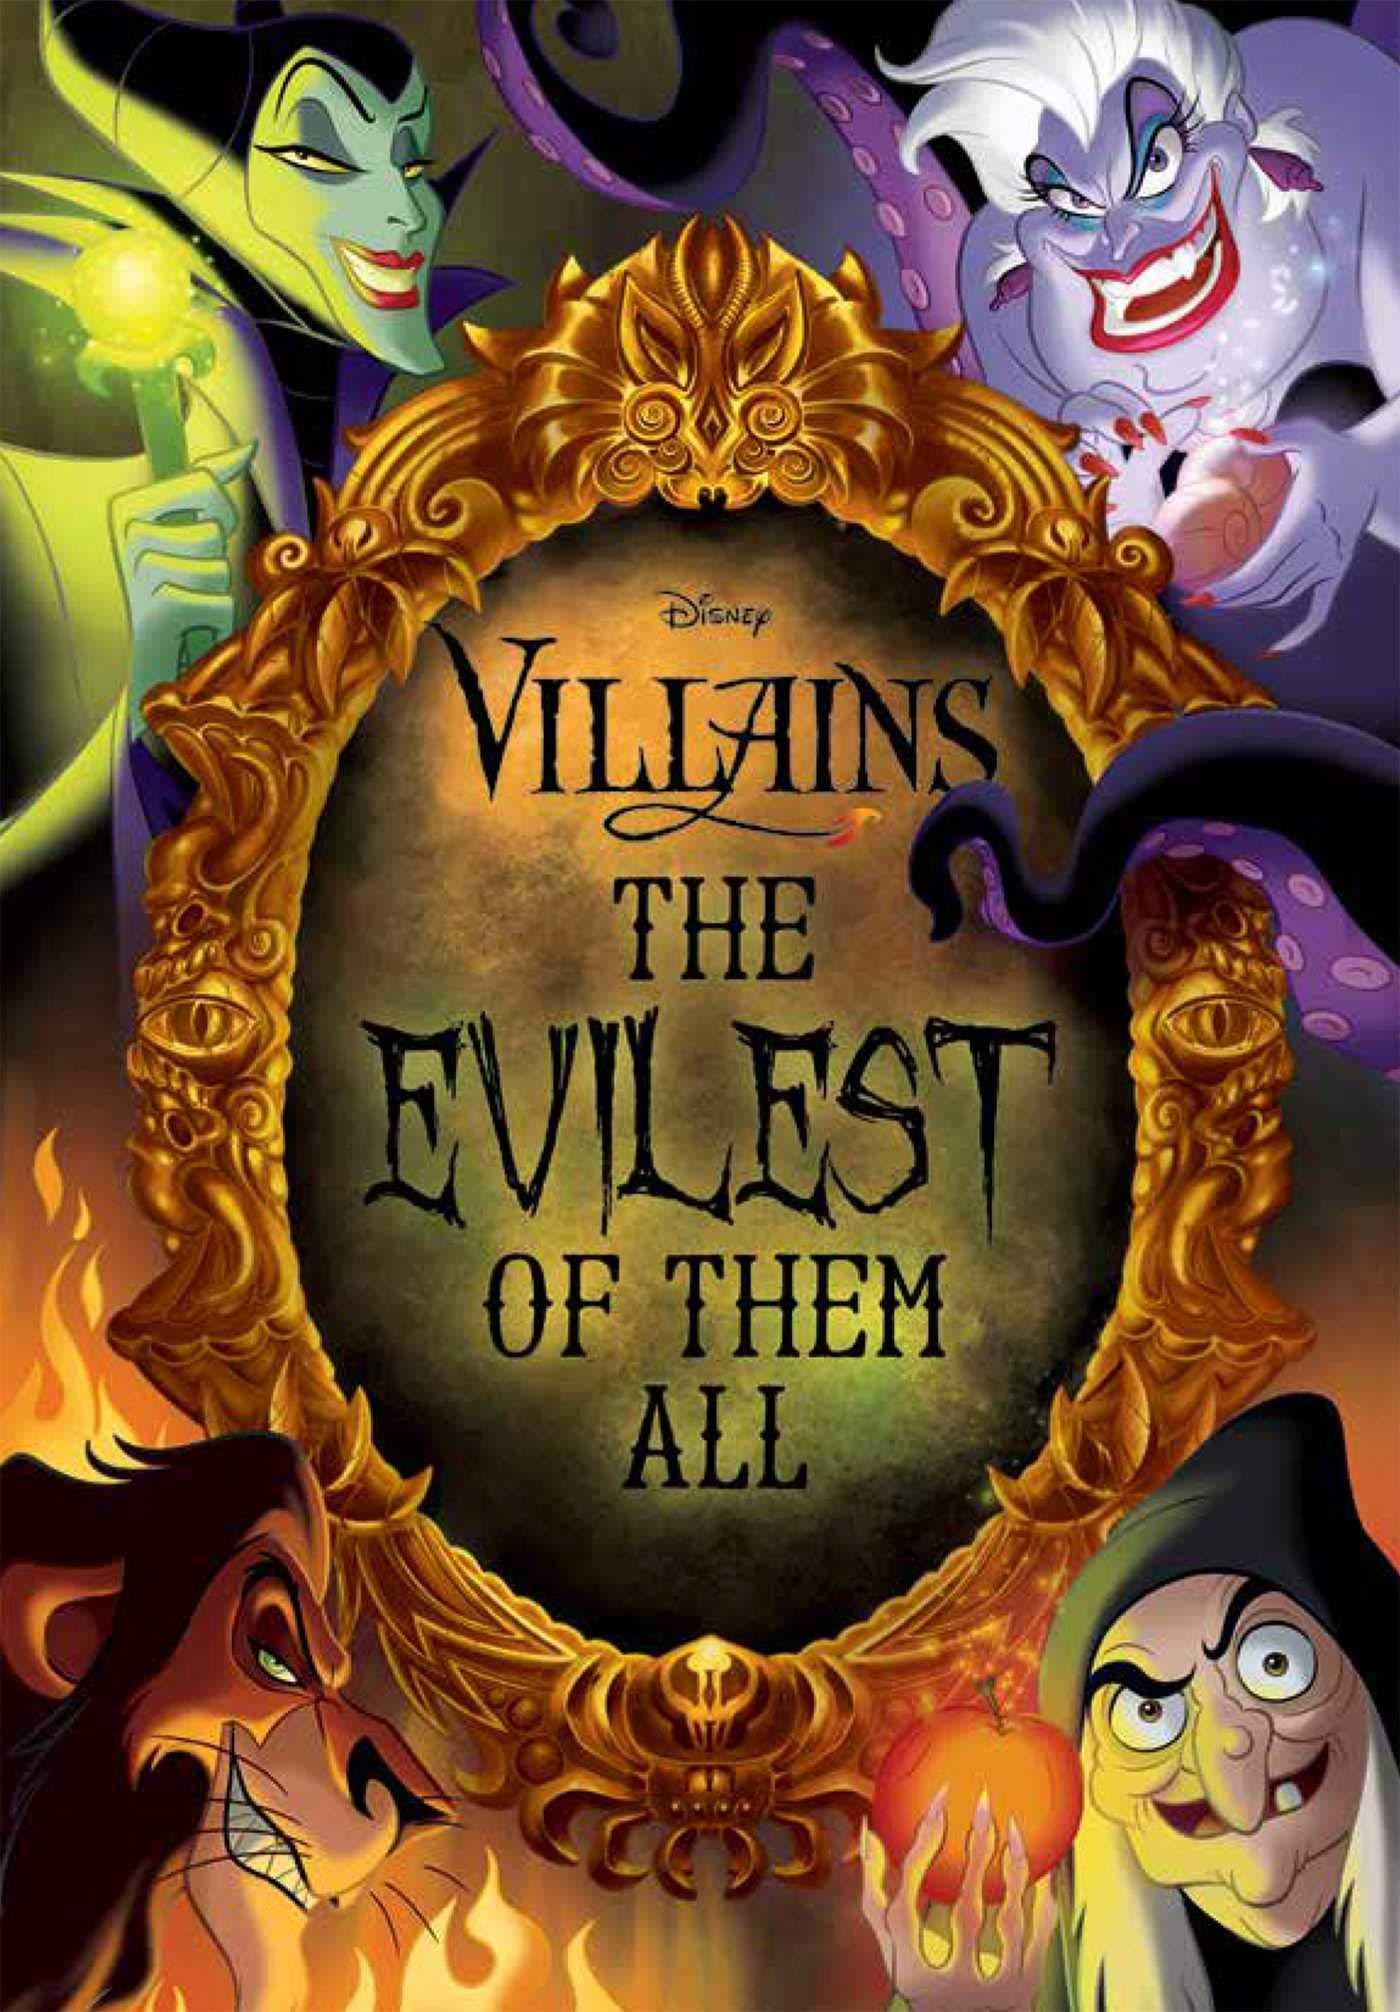 - Amazon.com: Disney Villains: The Evilest Of Them All (Replica